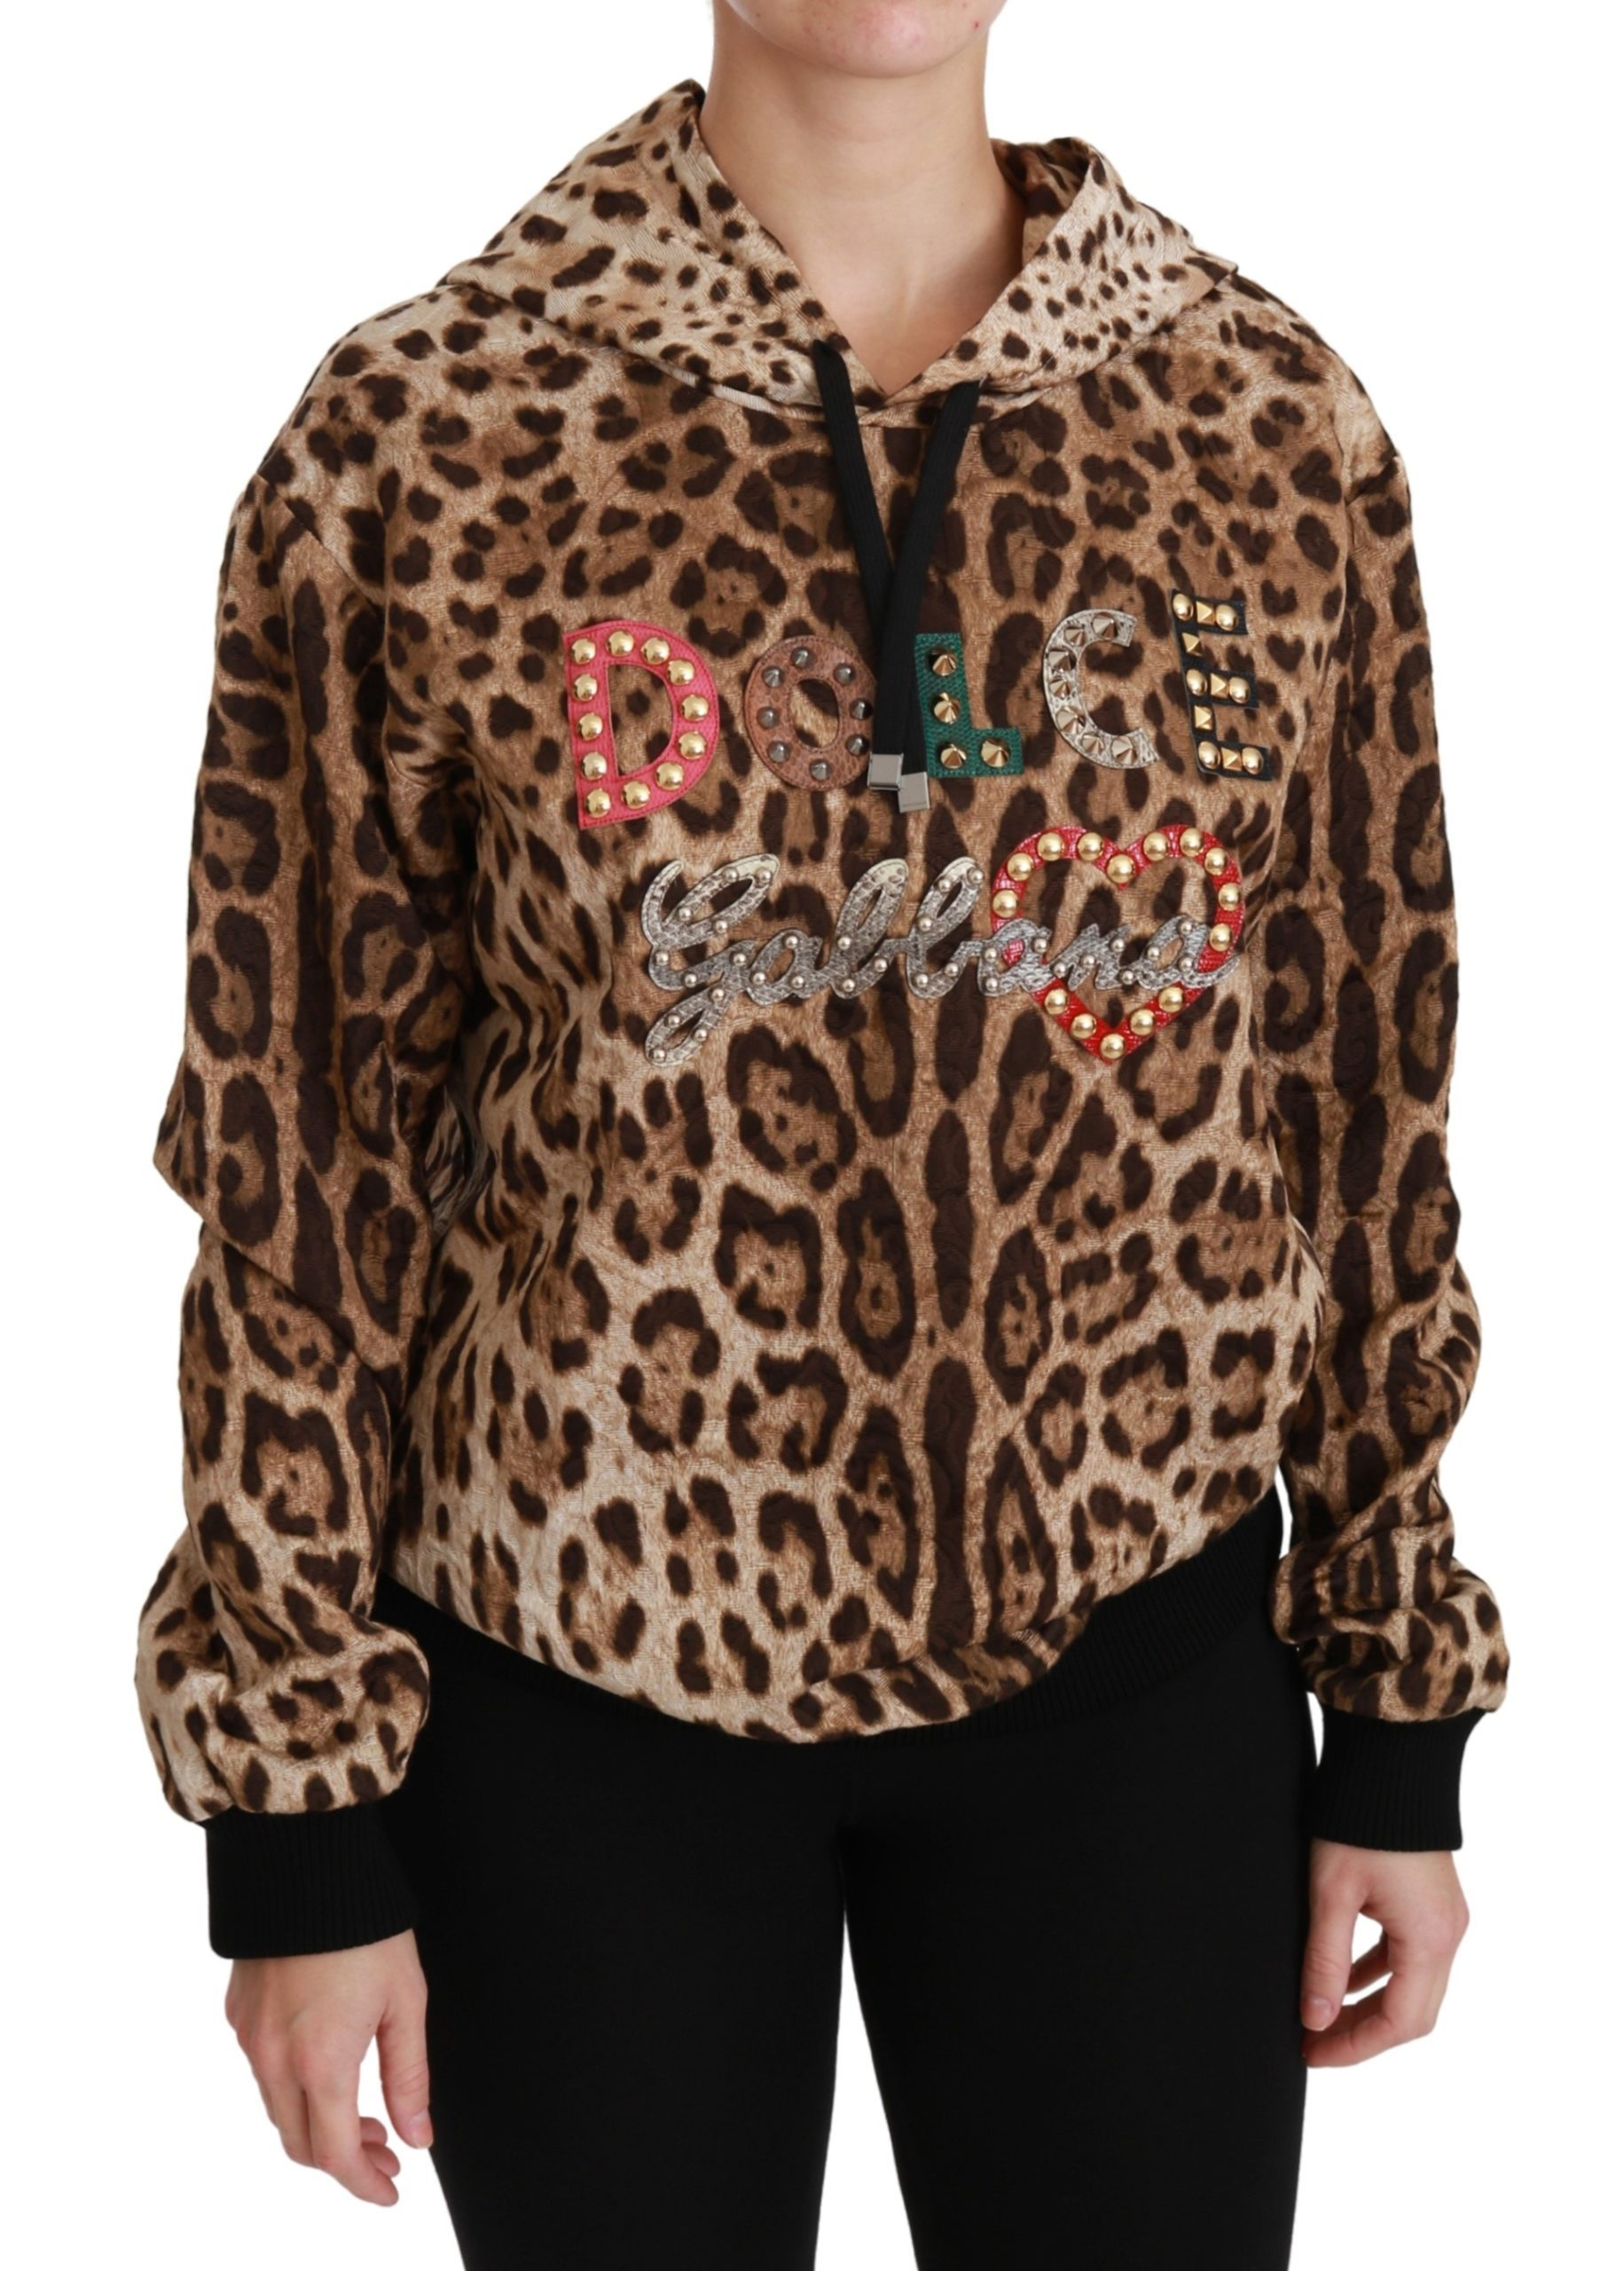 Dolce & Gabbana Women's Hooded Studded Ayers Leopard Sweater Brown TSH4420 - IT36 | S